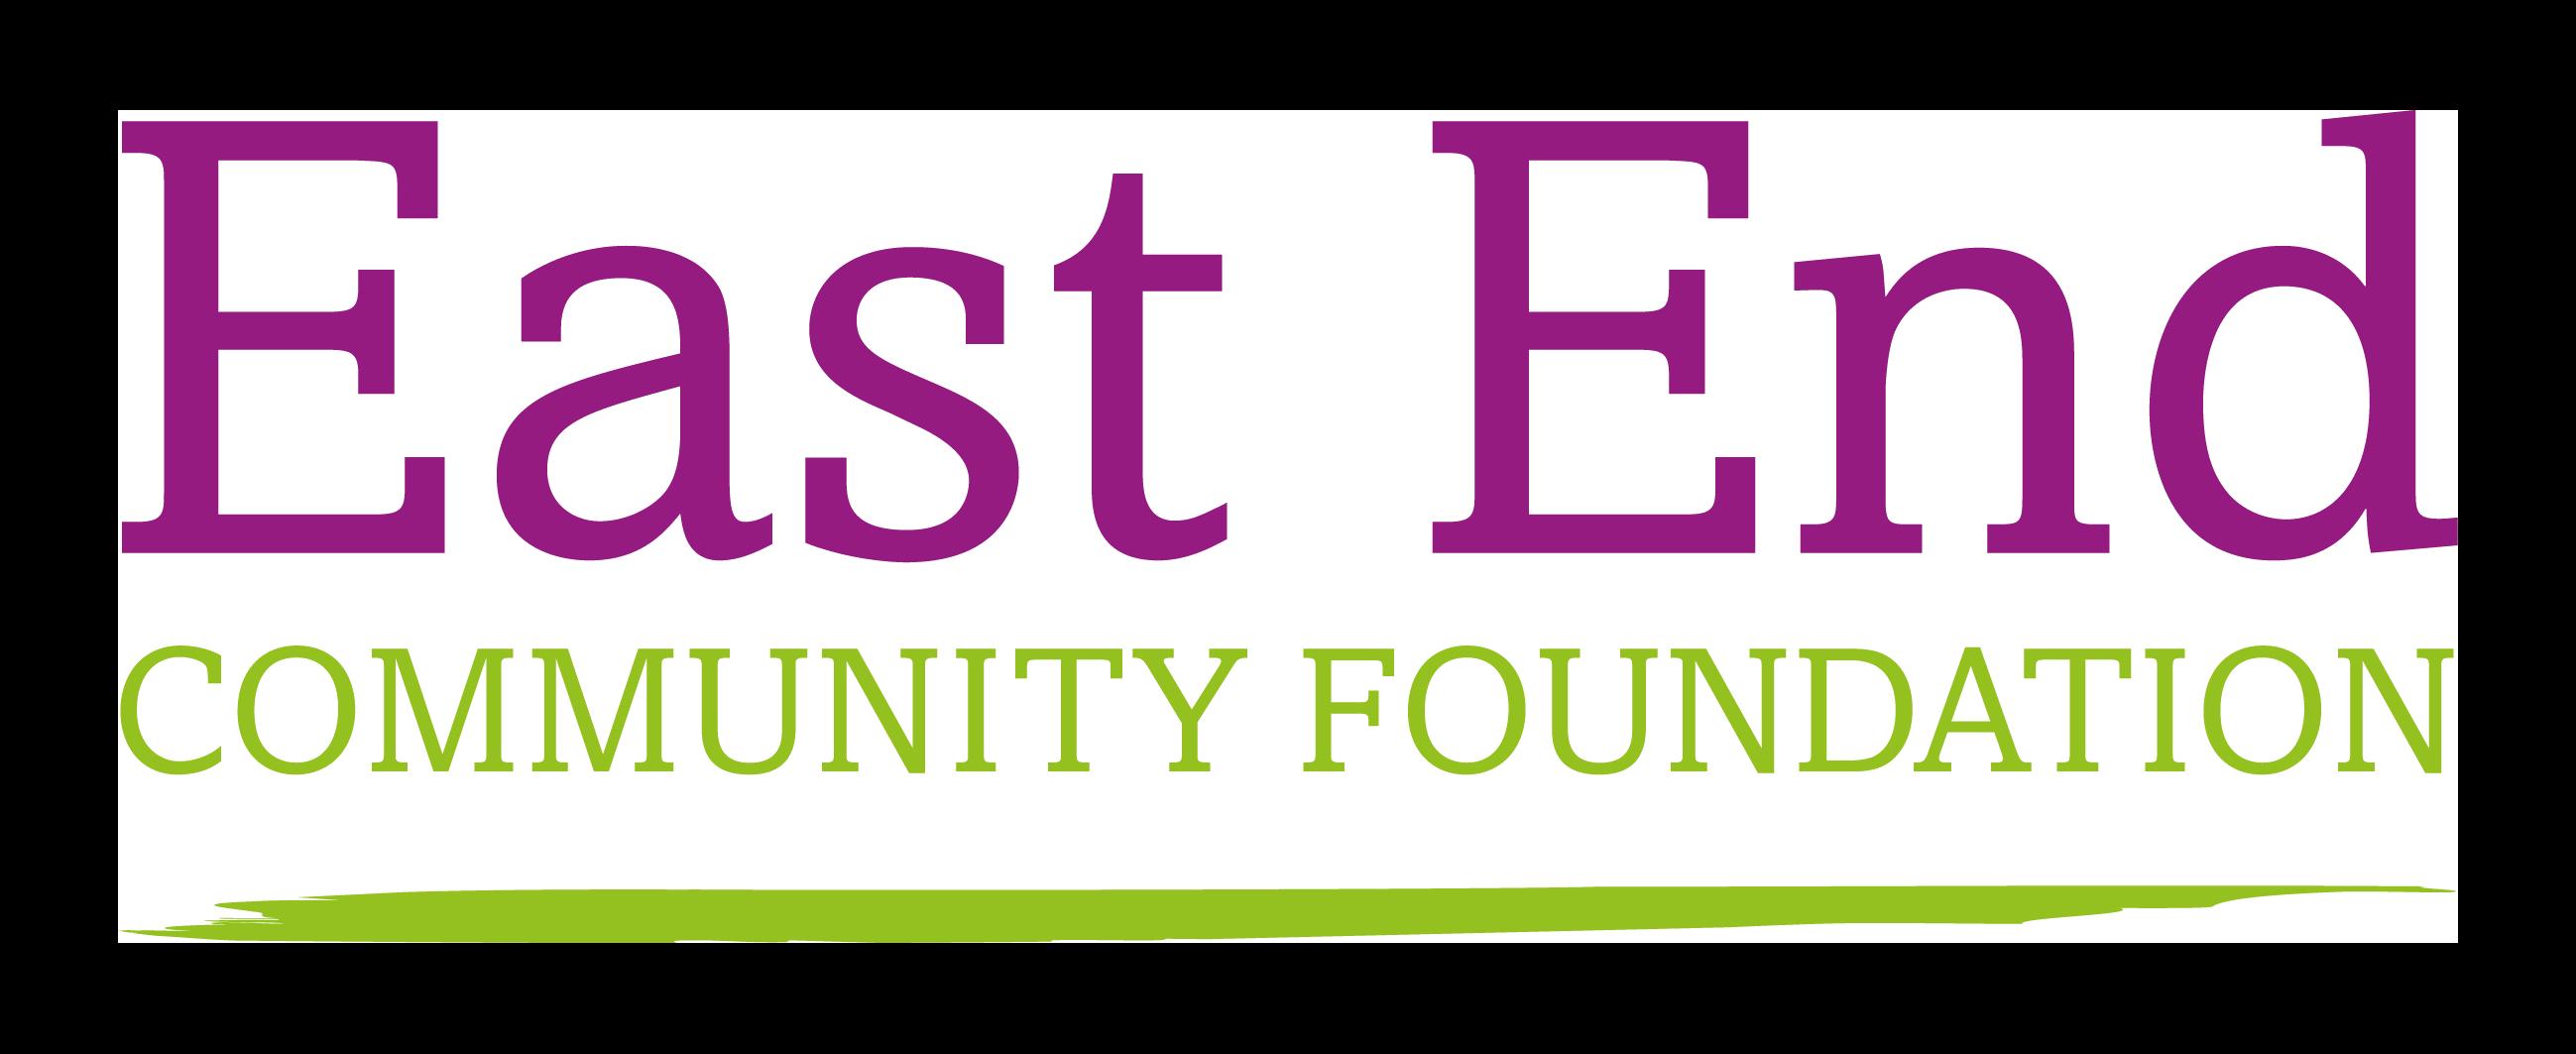 East End Community Foundation logo